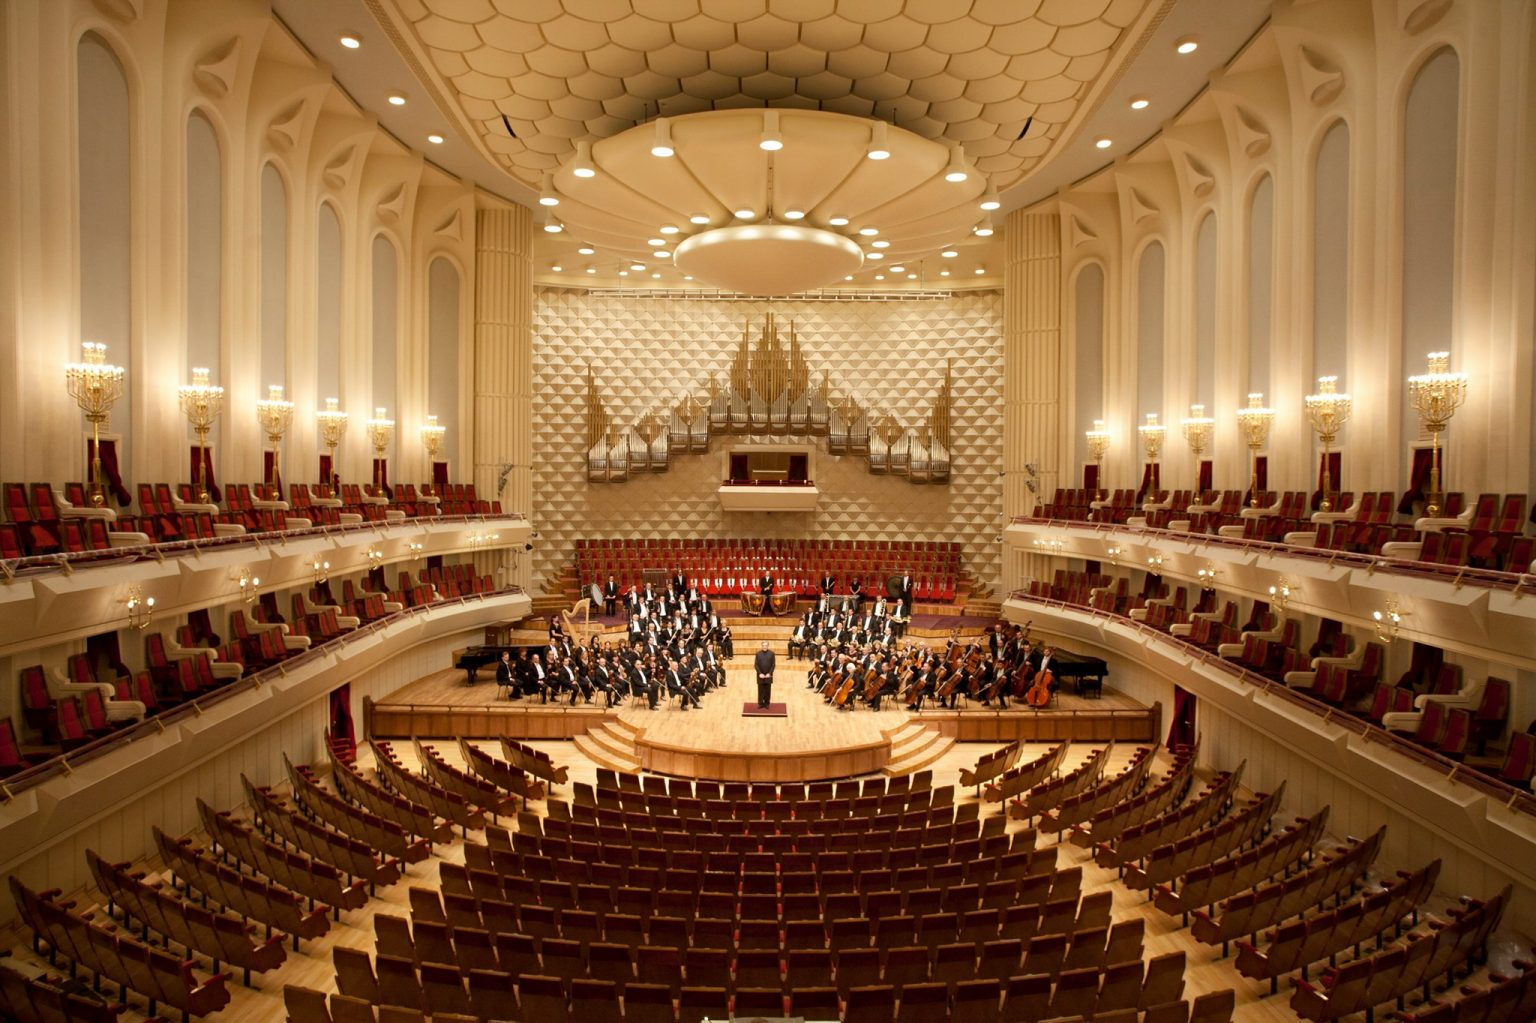 Tbilisi orchestra #новости Амадей Моцарт, Грузия, Реквием, Тбилисский симфонический оркестр